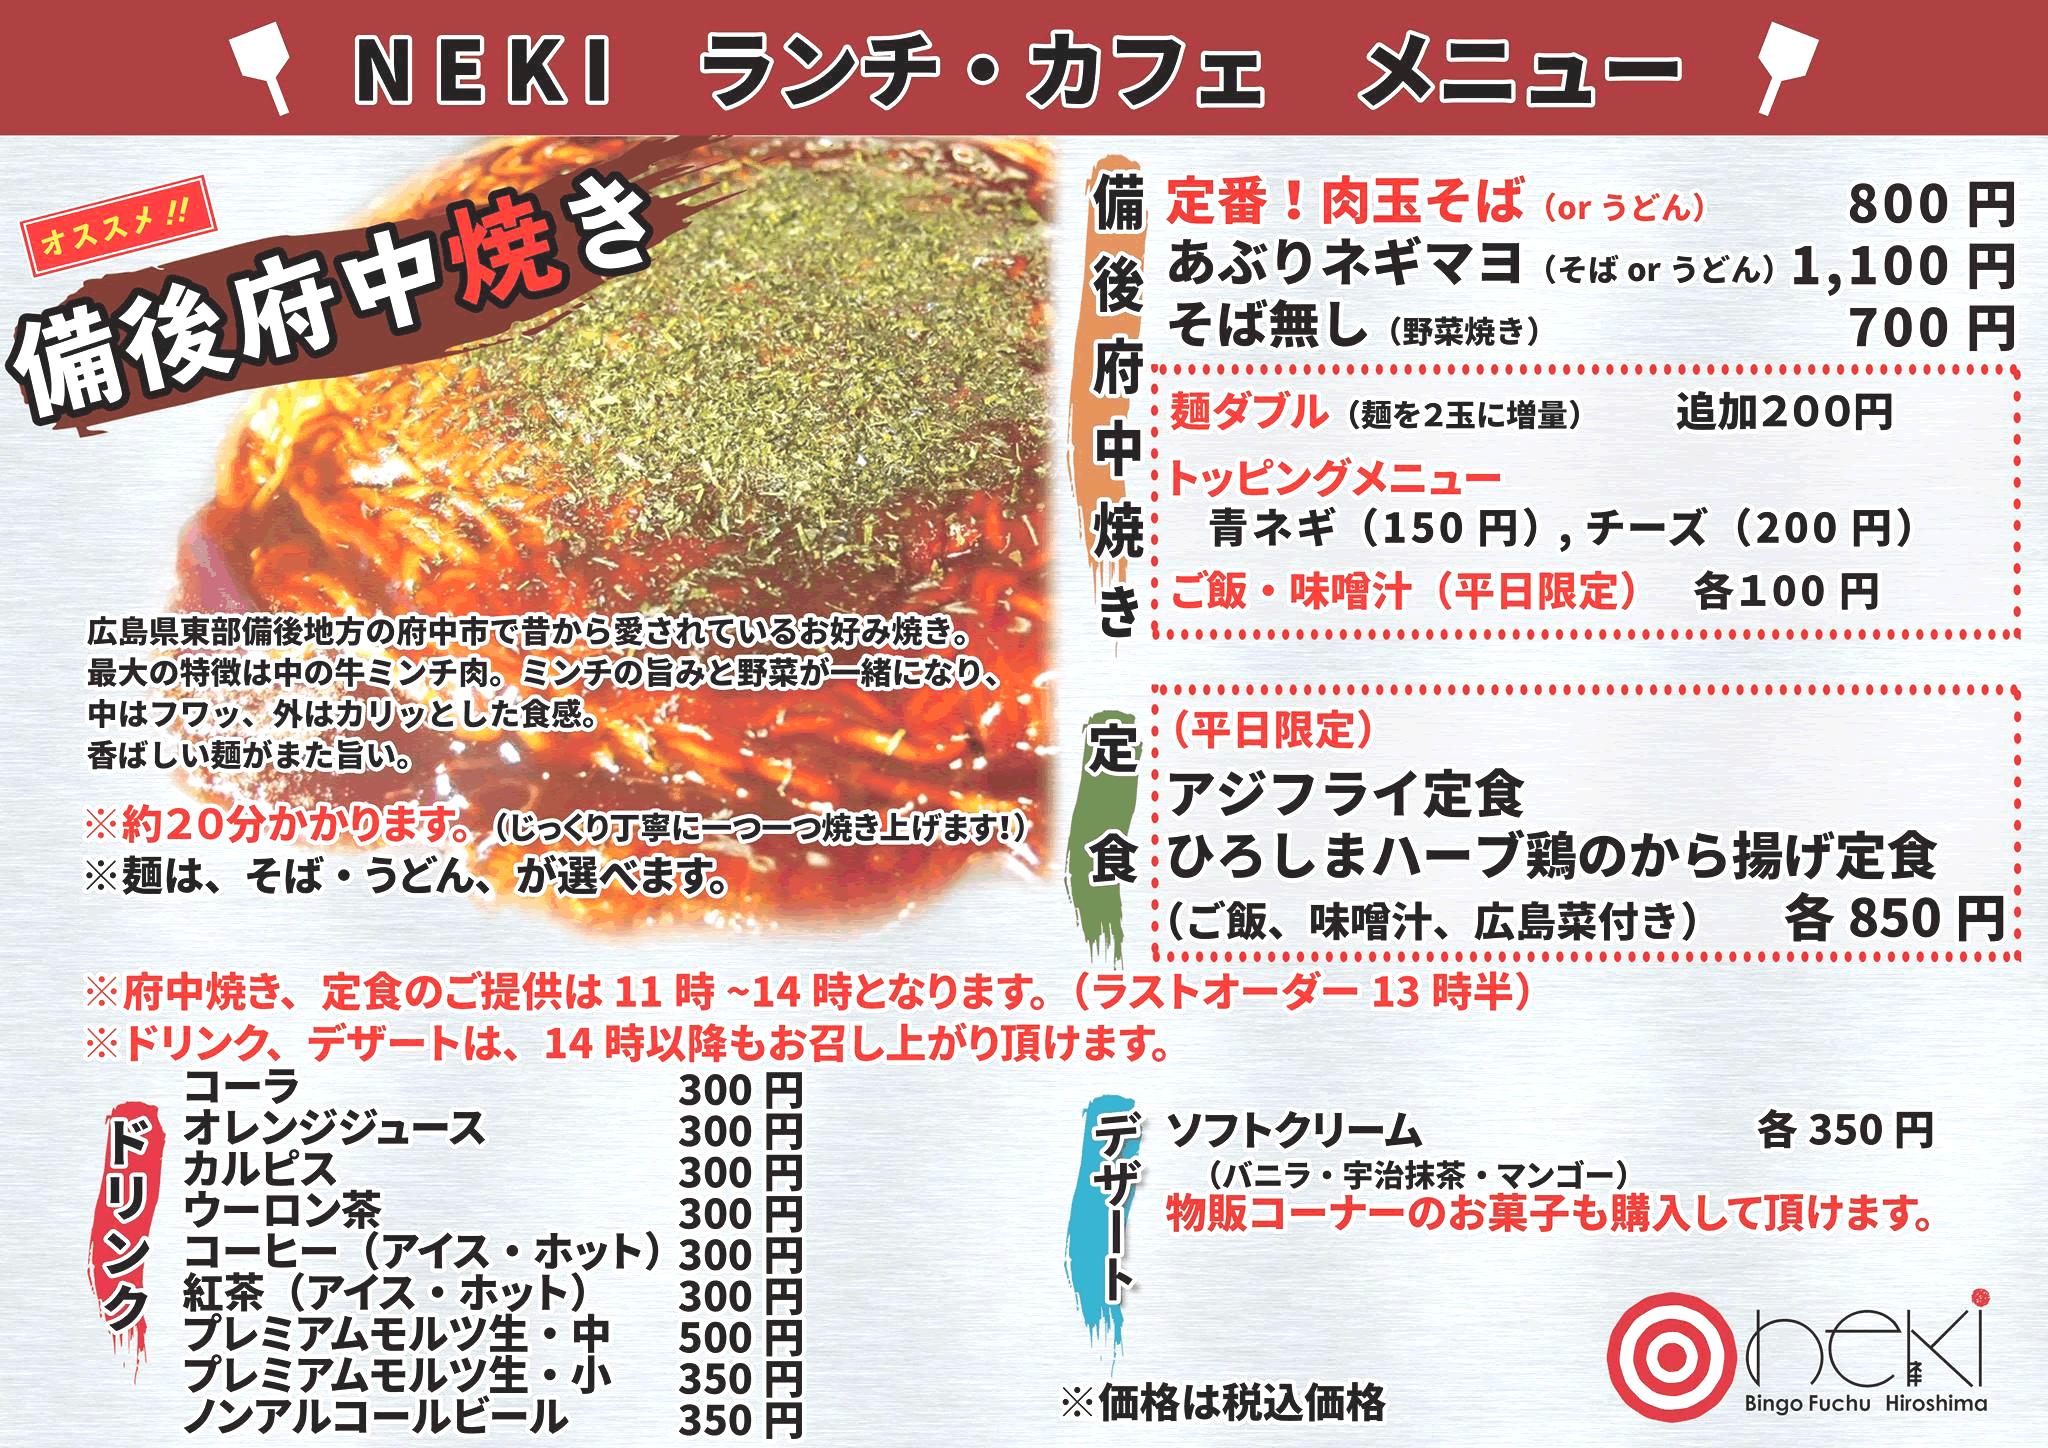 menu - 都内でカープ戦放映